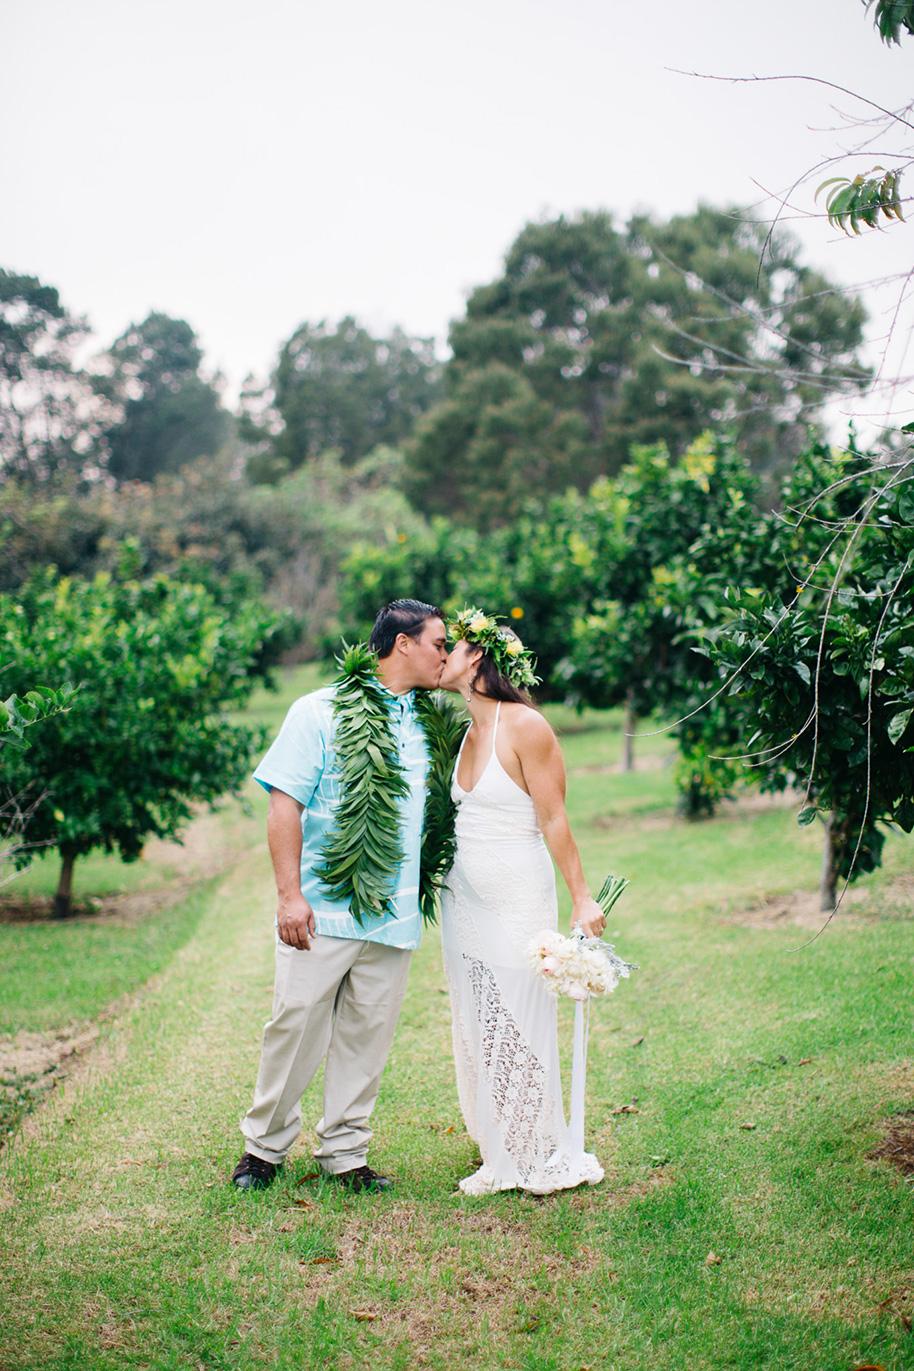 Maui-Ranch-Wedding-032717-23.jpg